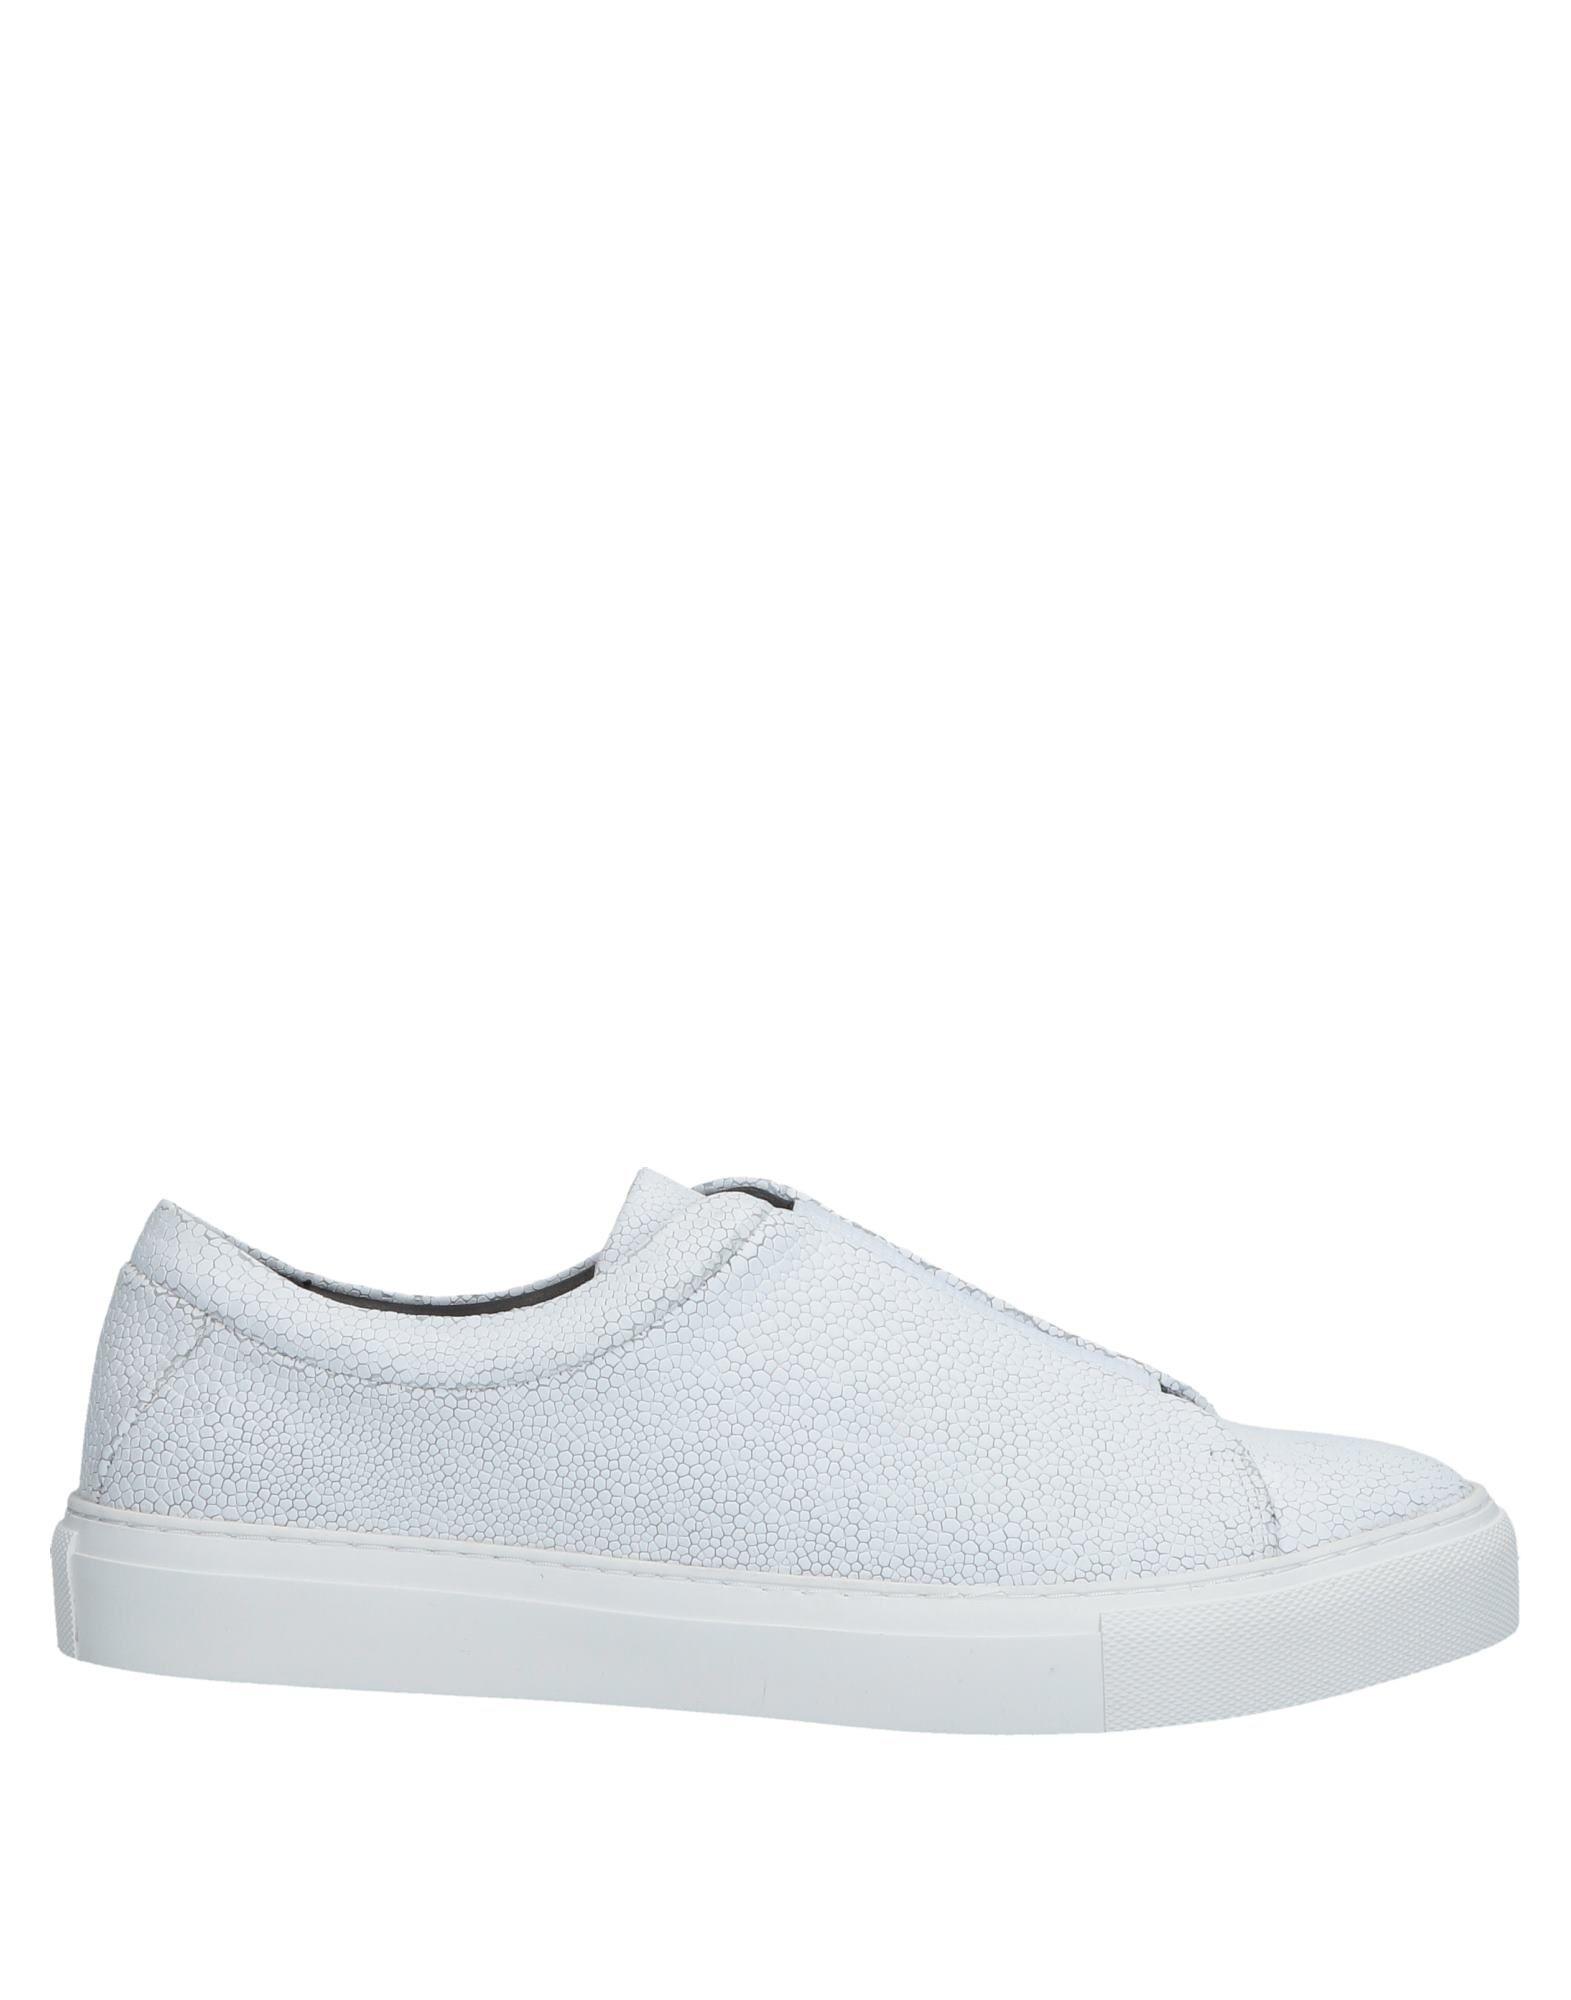 Royal Republiq Sneakers - Women Royal Republiq Sneakers online 11574005CA on  Australia - 11574005CA online cdf518